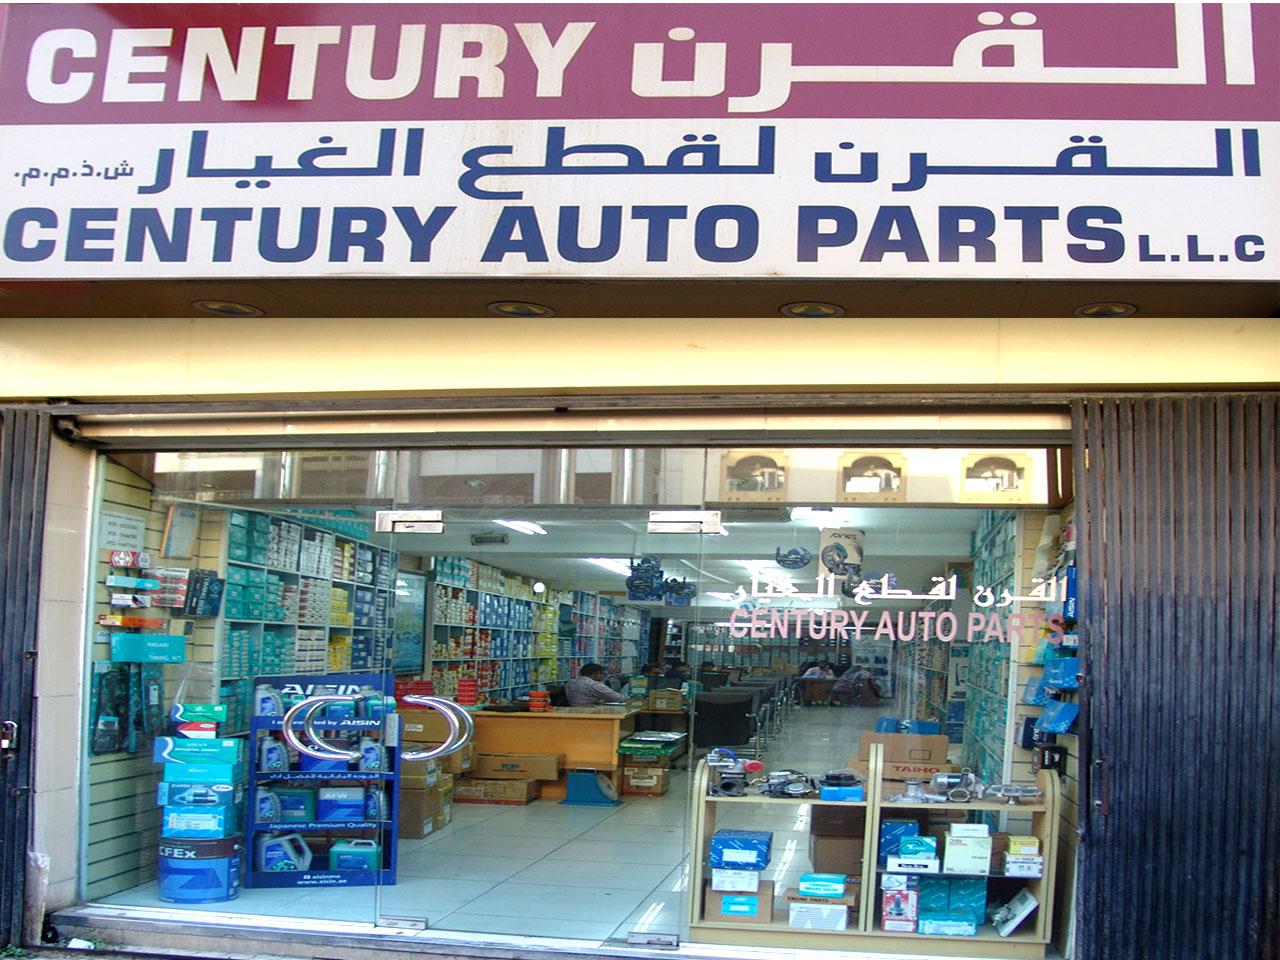 Century Auto Parts - 1.jpg